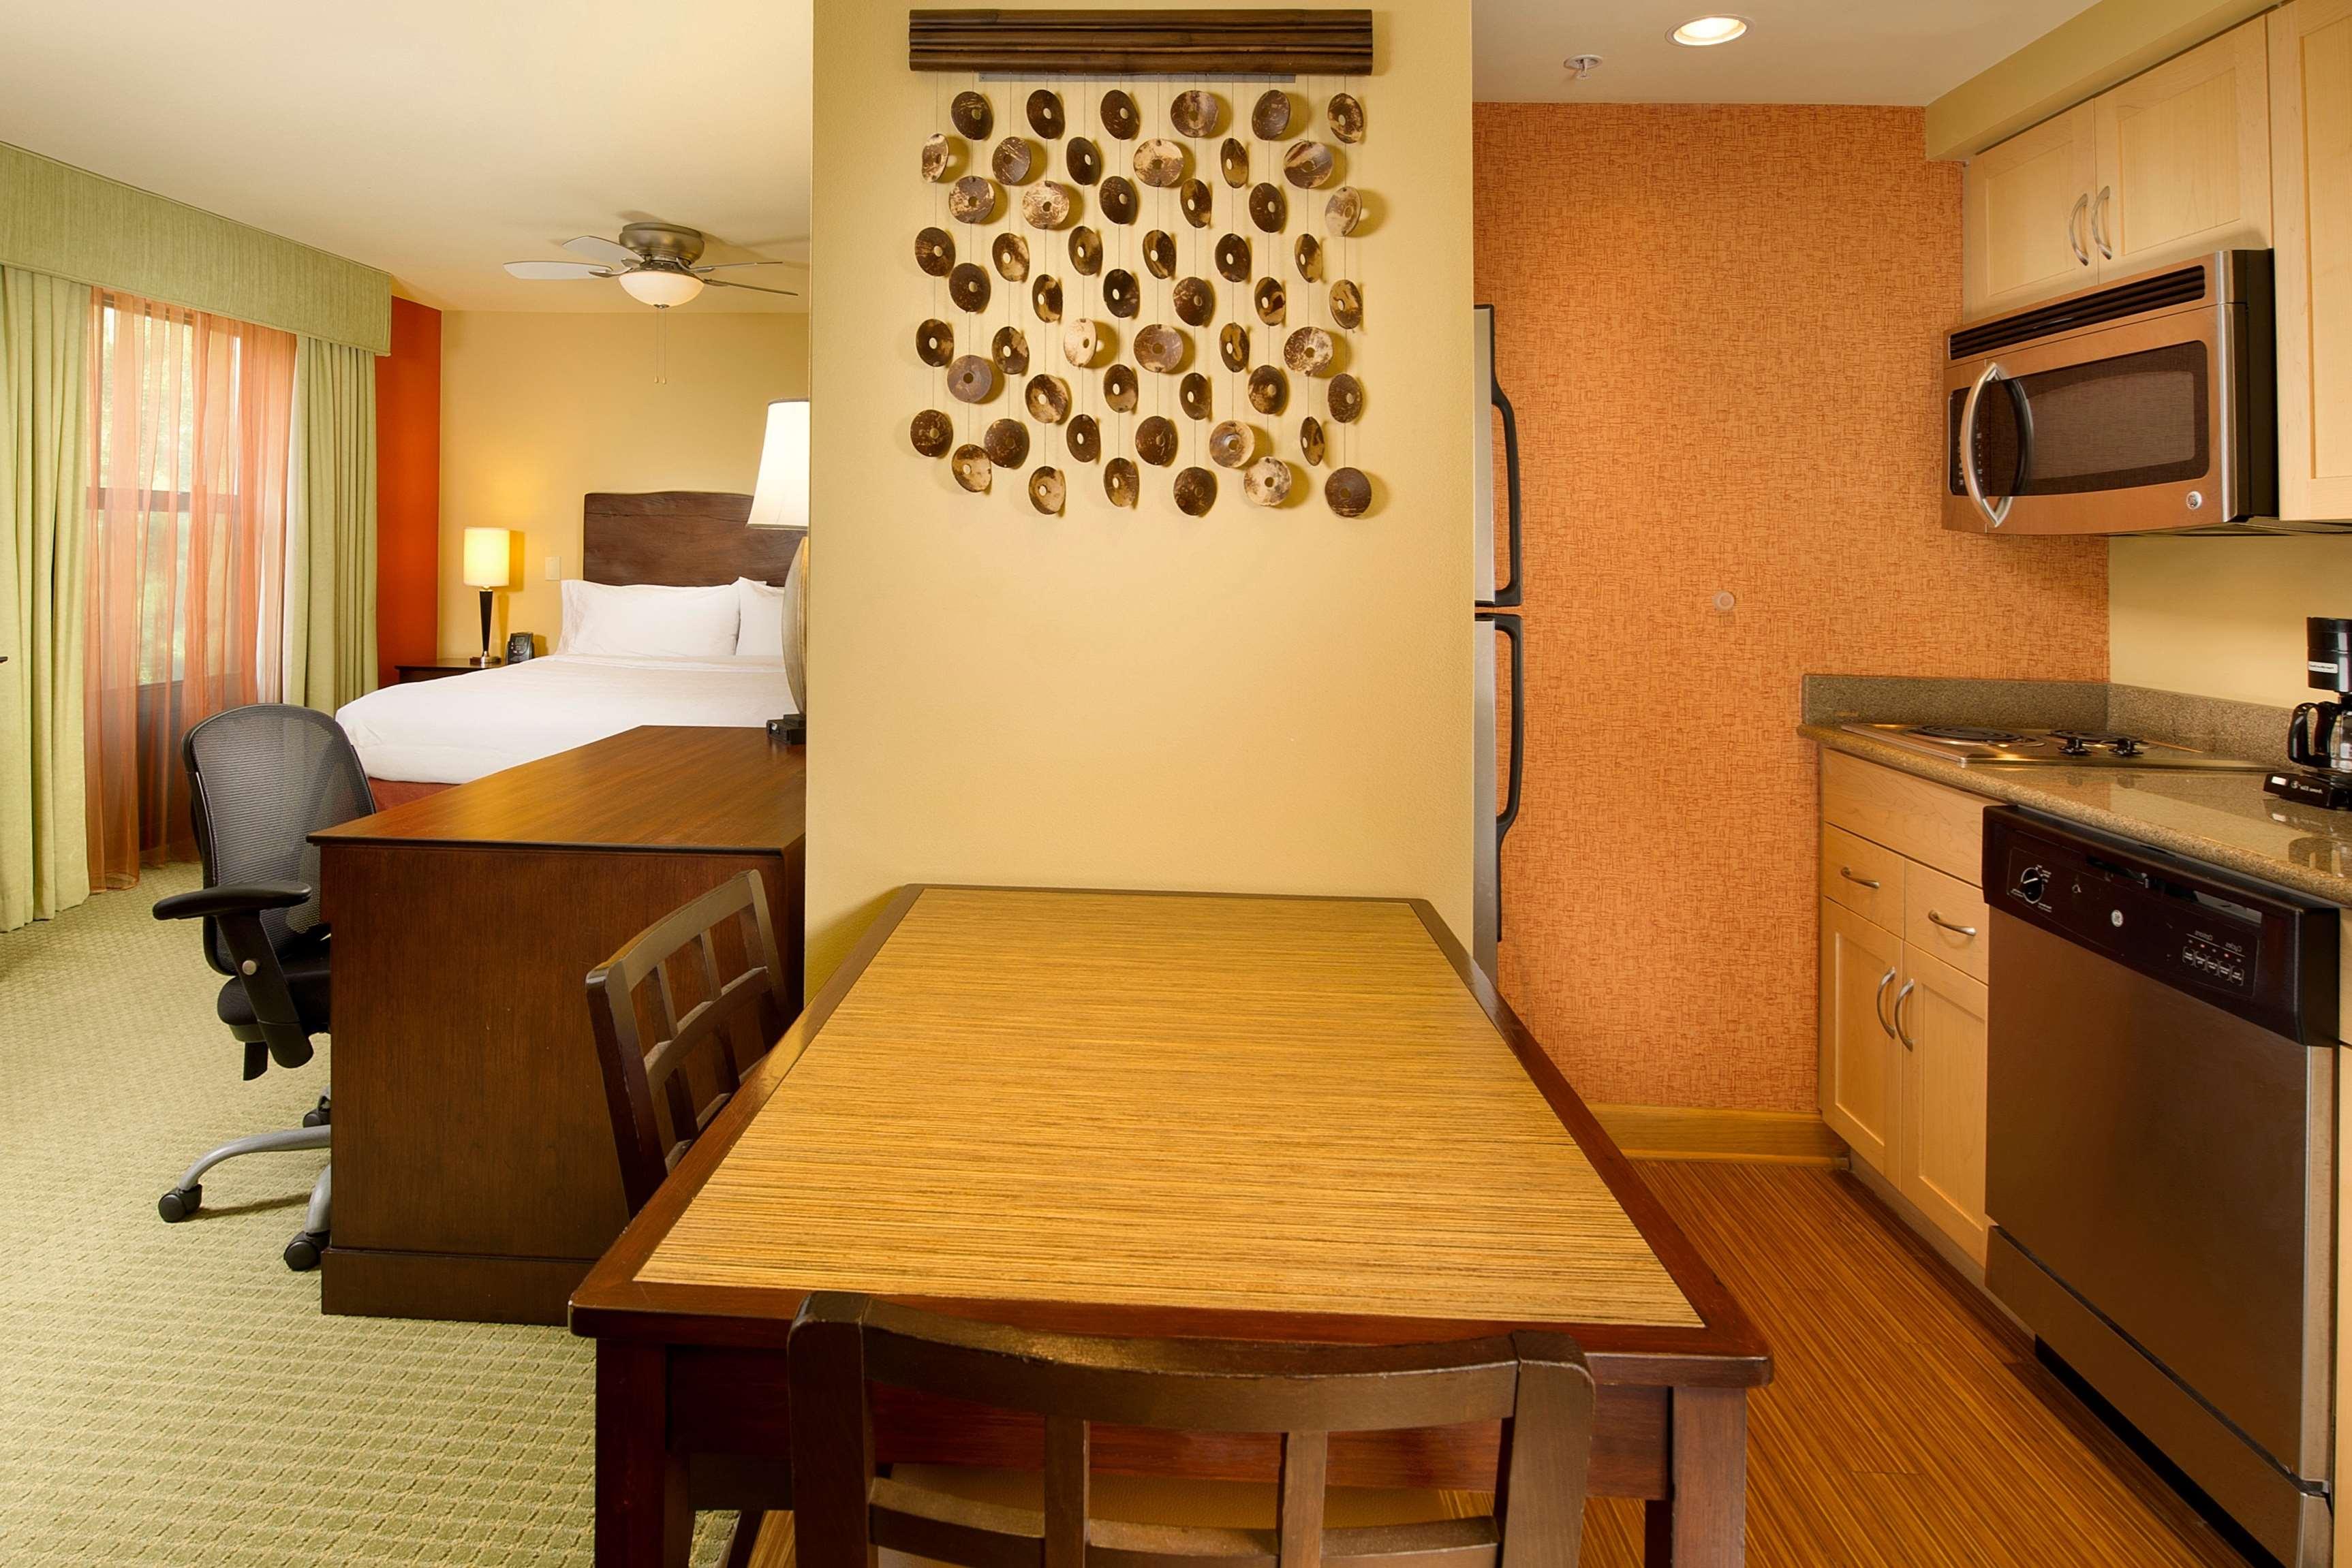 Homewood Suites by Hilton Columbus image 24